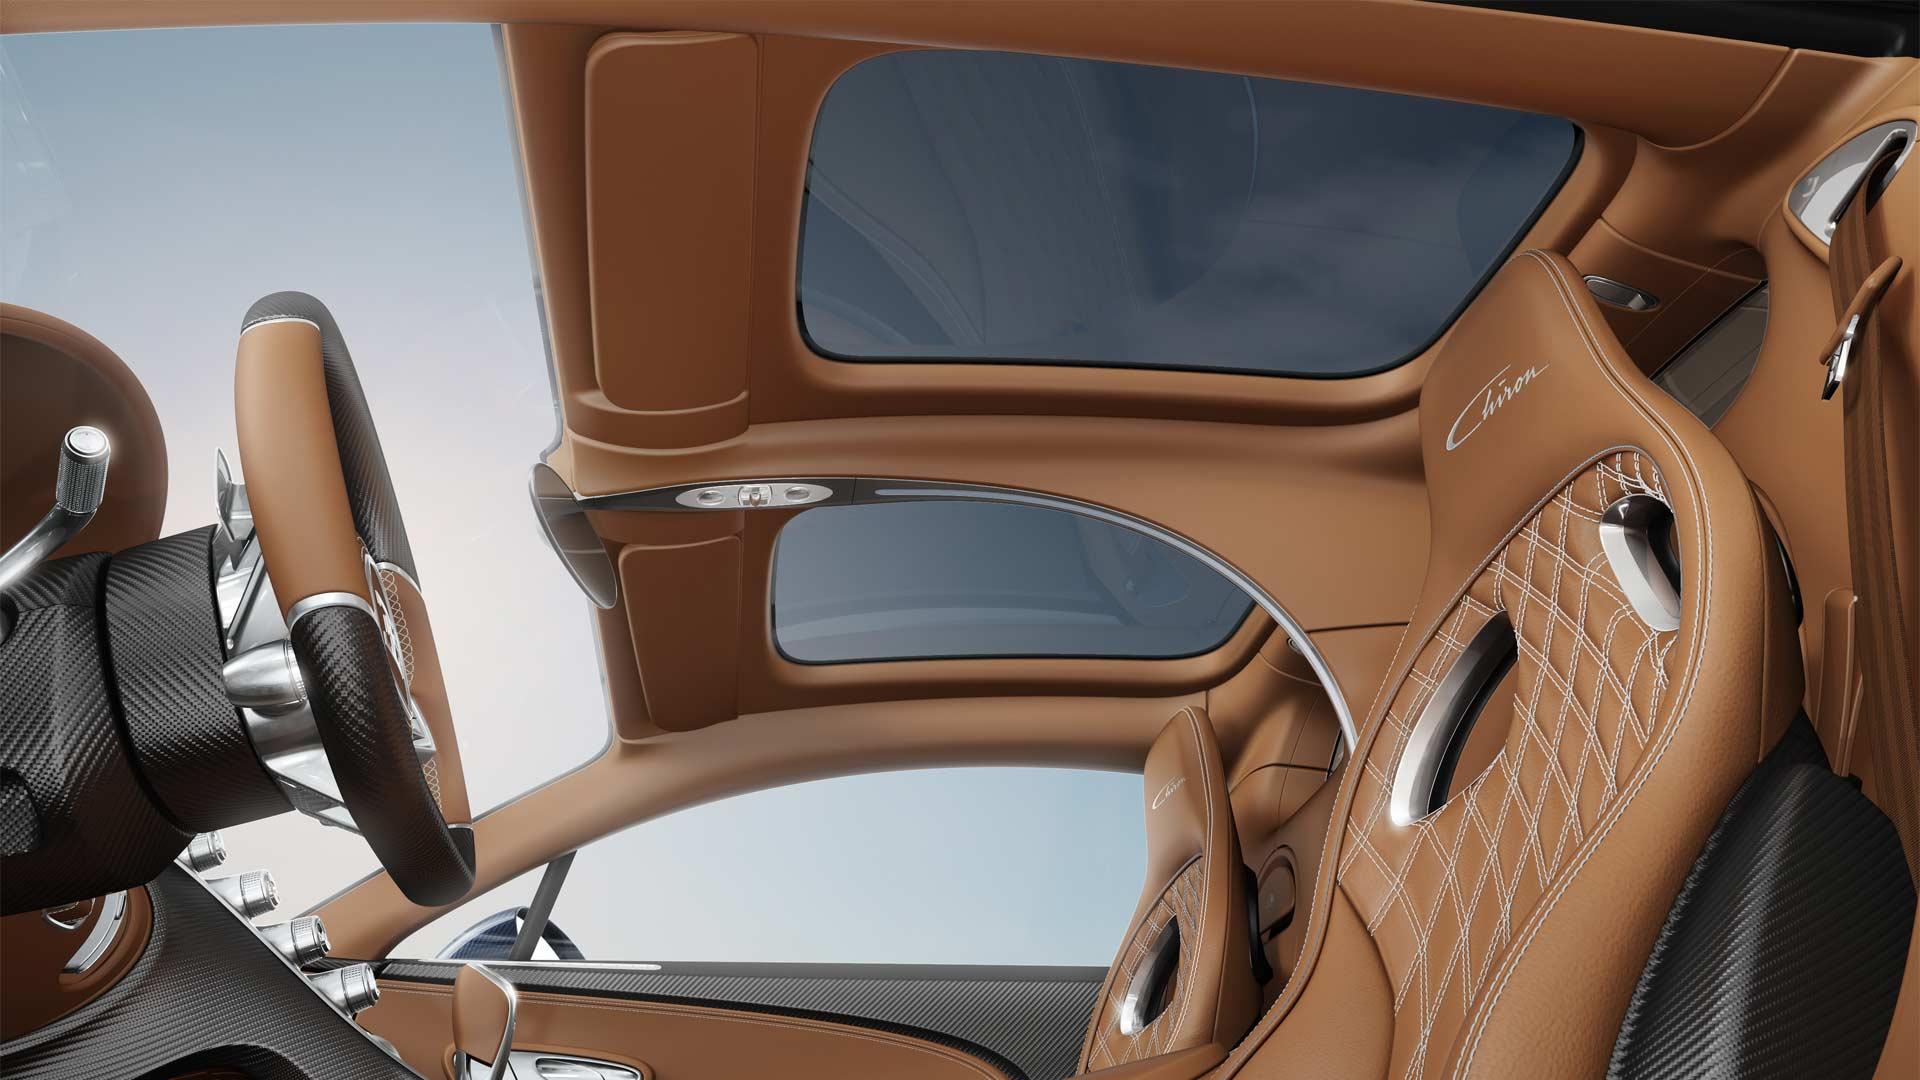 Bugatti-Chiron-Sky-View-glass-roof-inside